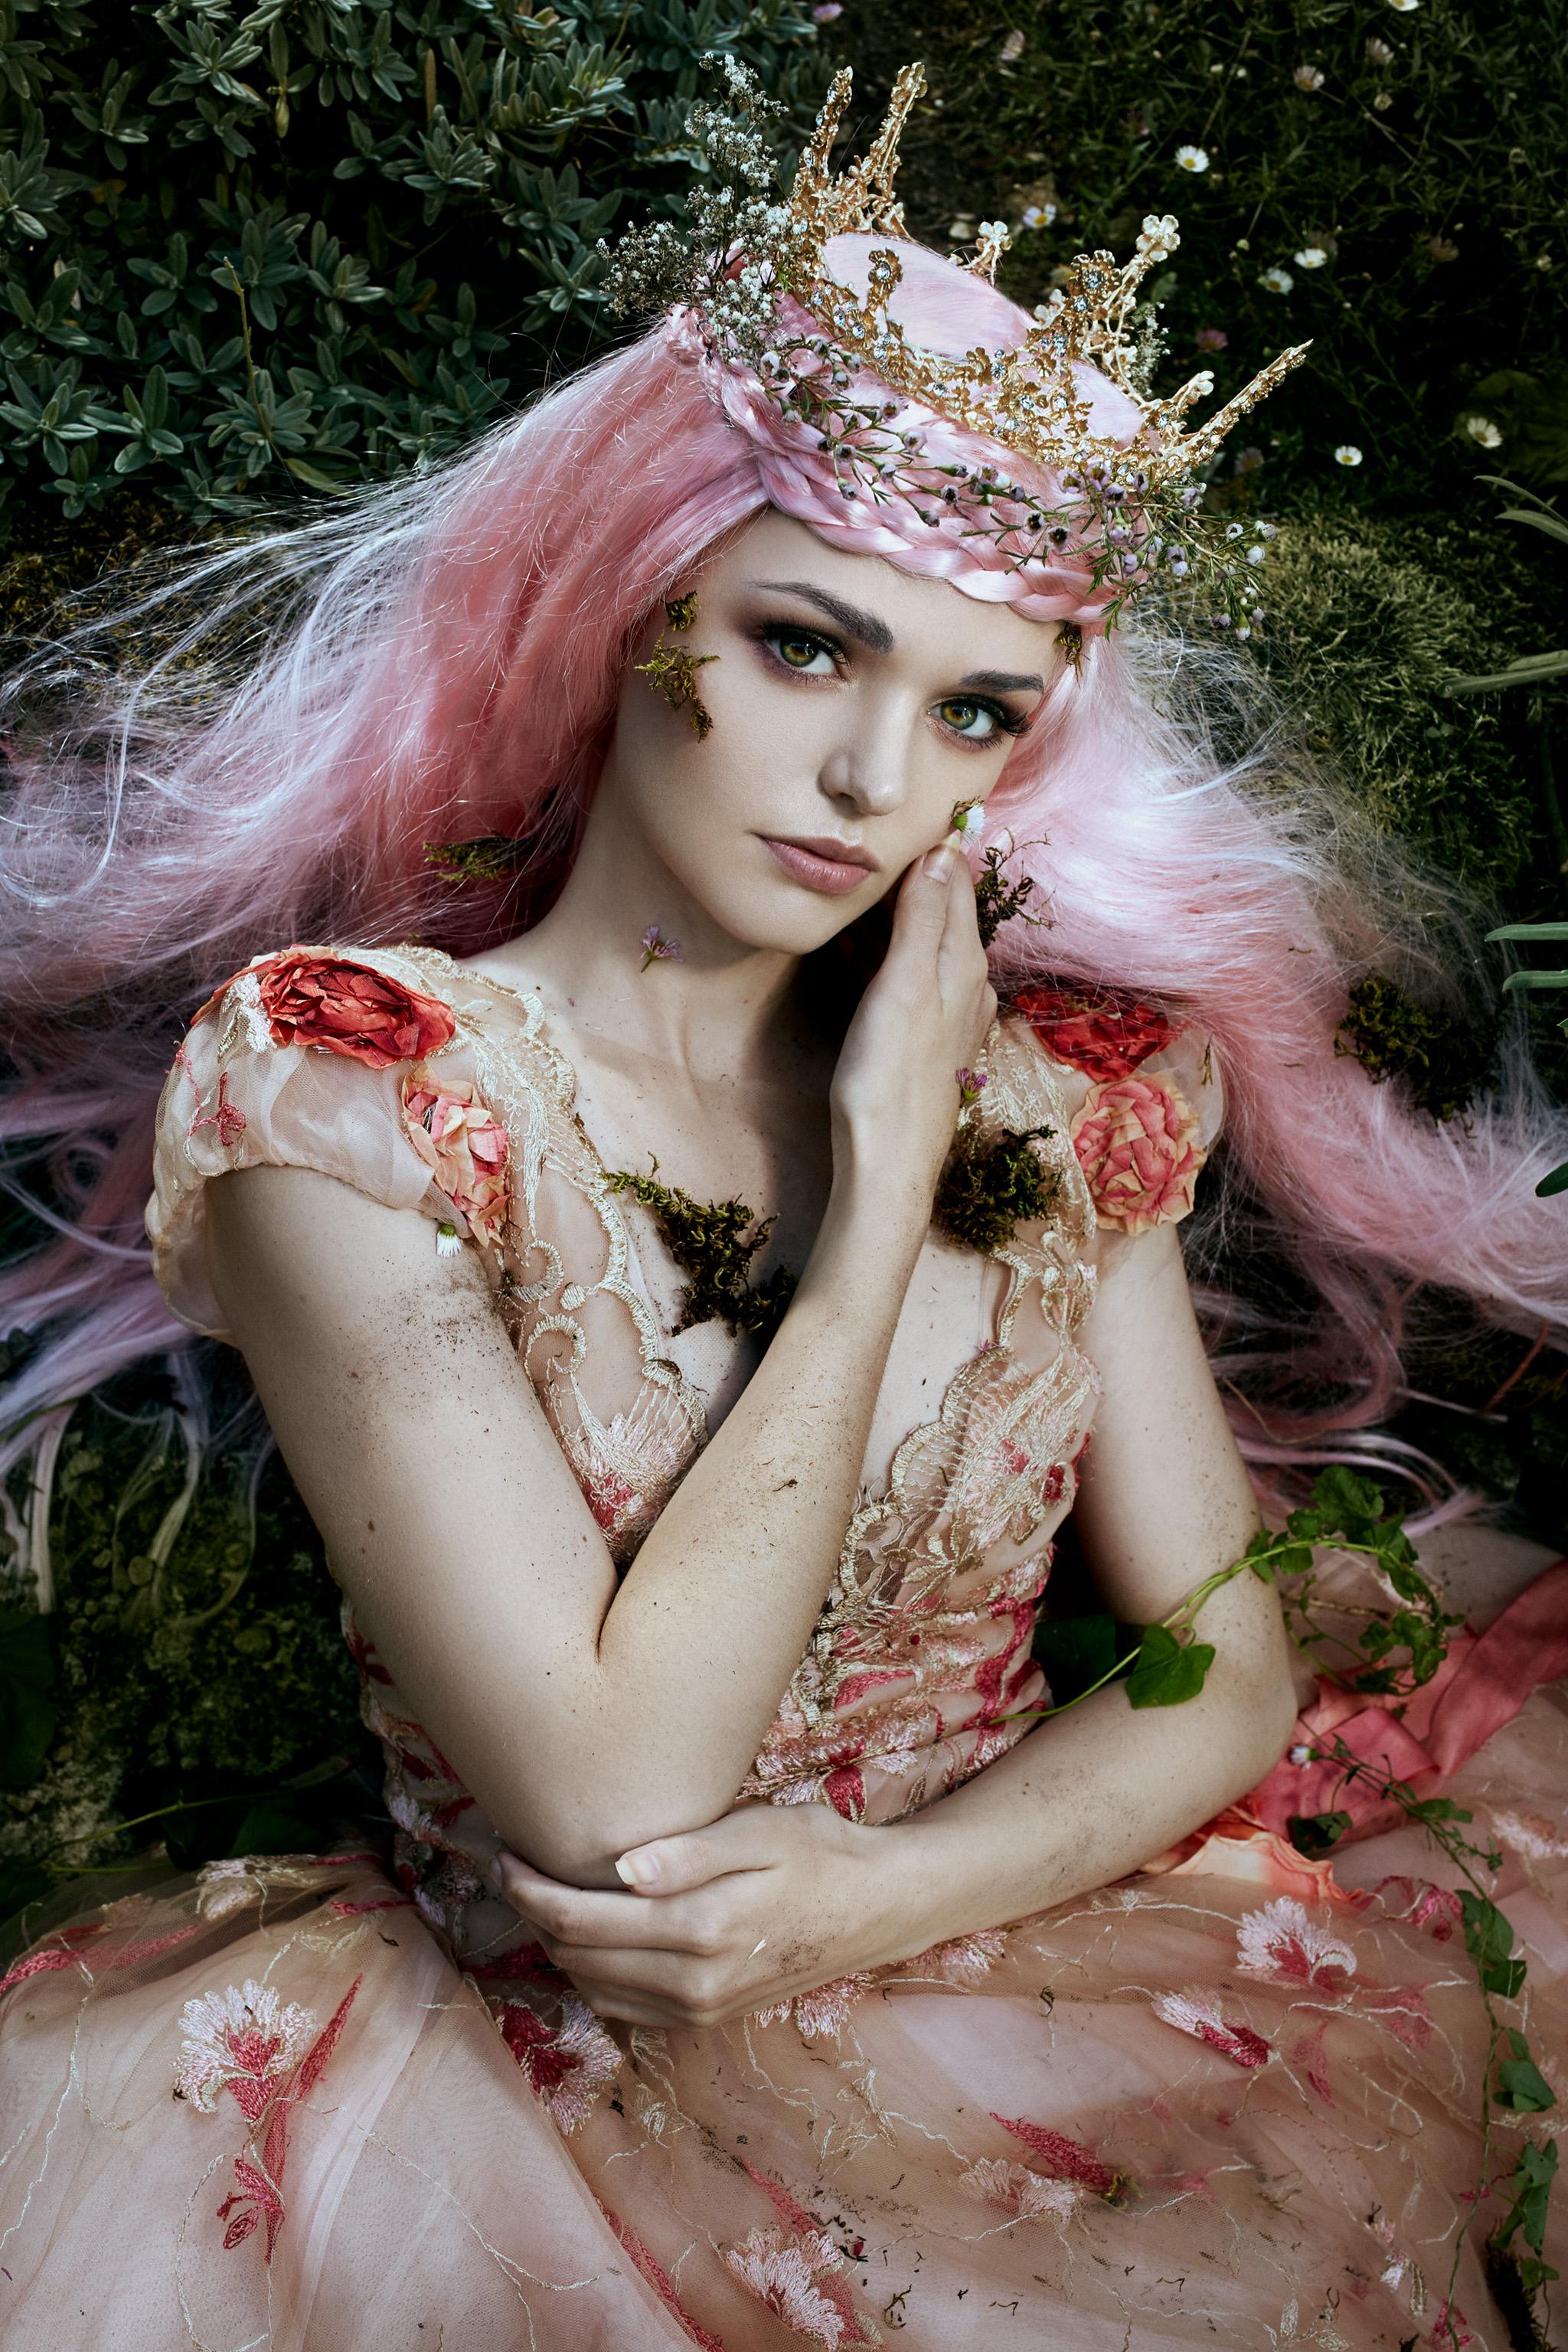 Bella_Kotak_Profoto_Canon_Fairytale_Fantasy_Photography_Portrait_Portraiture_Flowers_FLoral_Queen_Princess_Disney_Fashion_Editorial_A1_Lighting_Pink_Hair_Magical_Ethereal_Solstice_Retouch_1.jpg